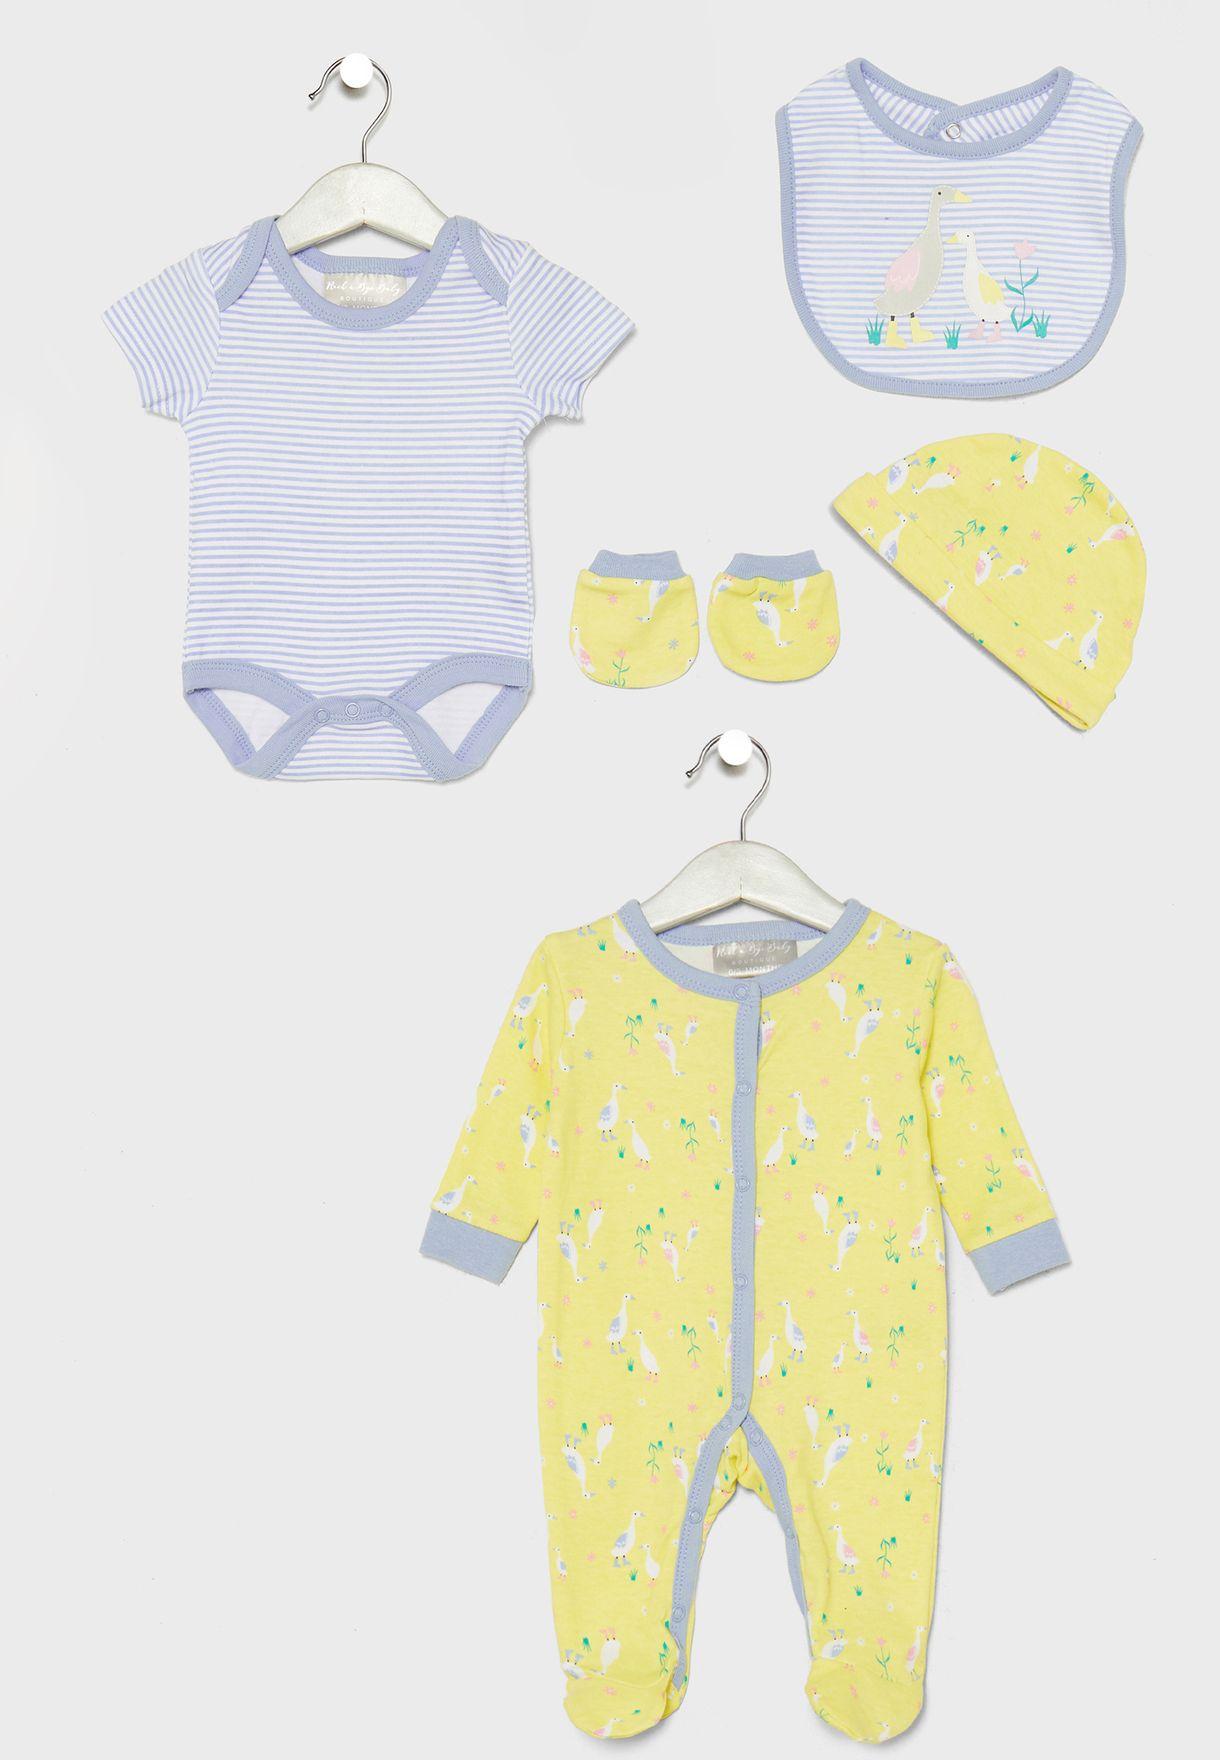 Infant 5 Piece Gift Set